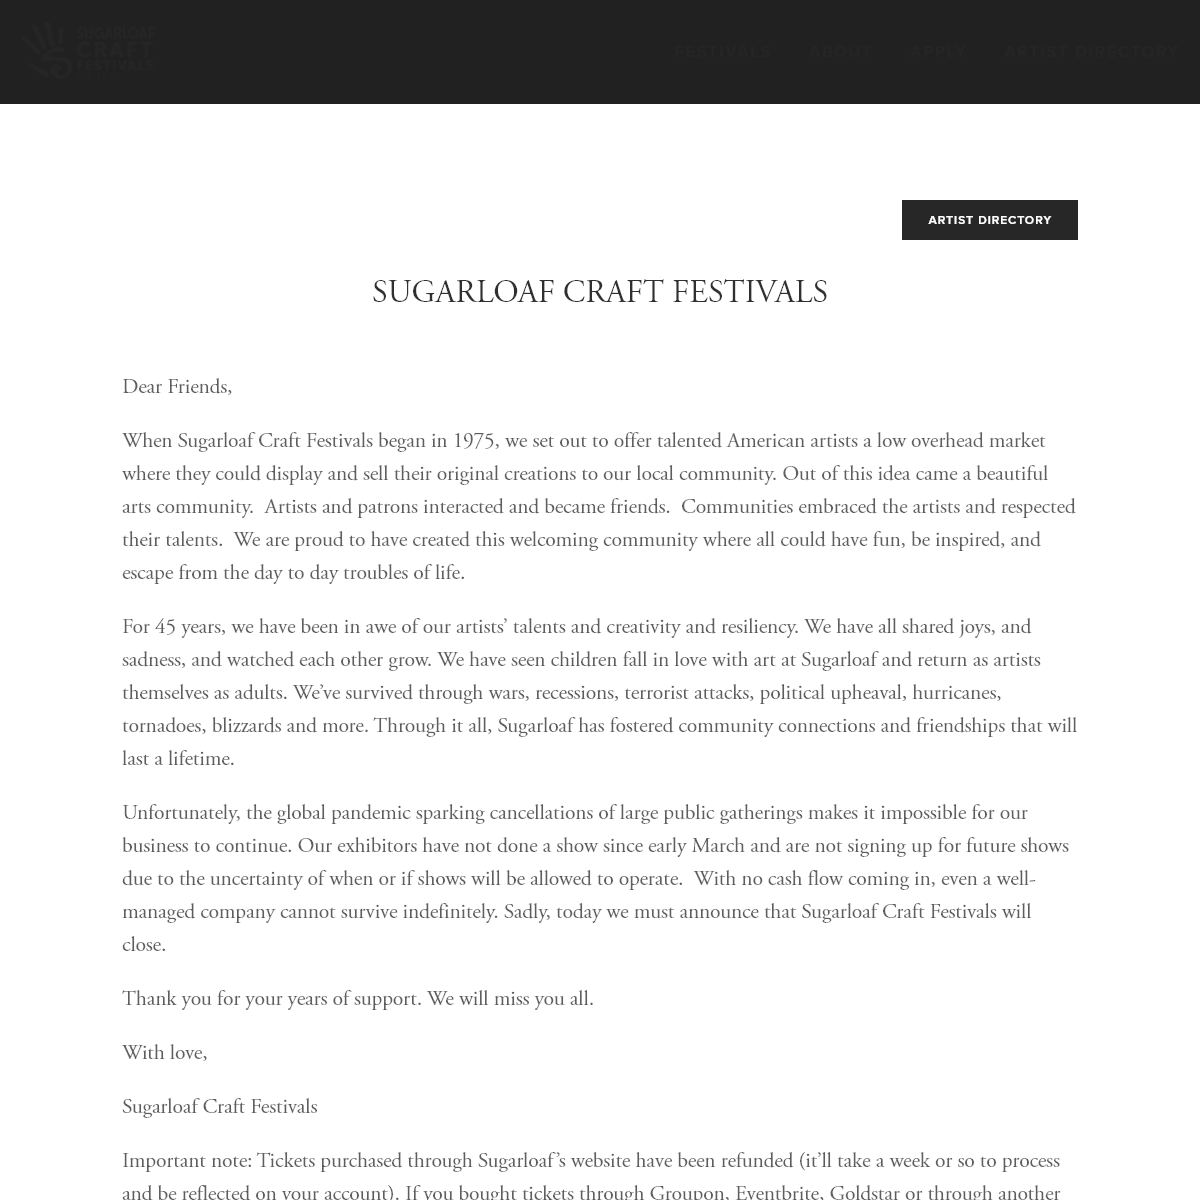 Sugarloaf Craft Festivals